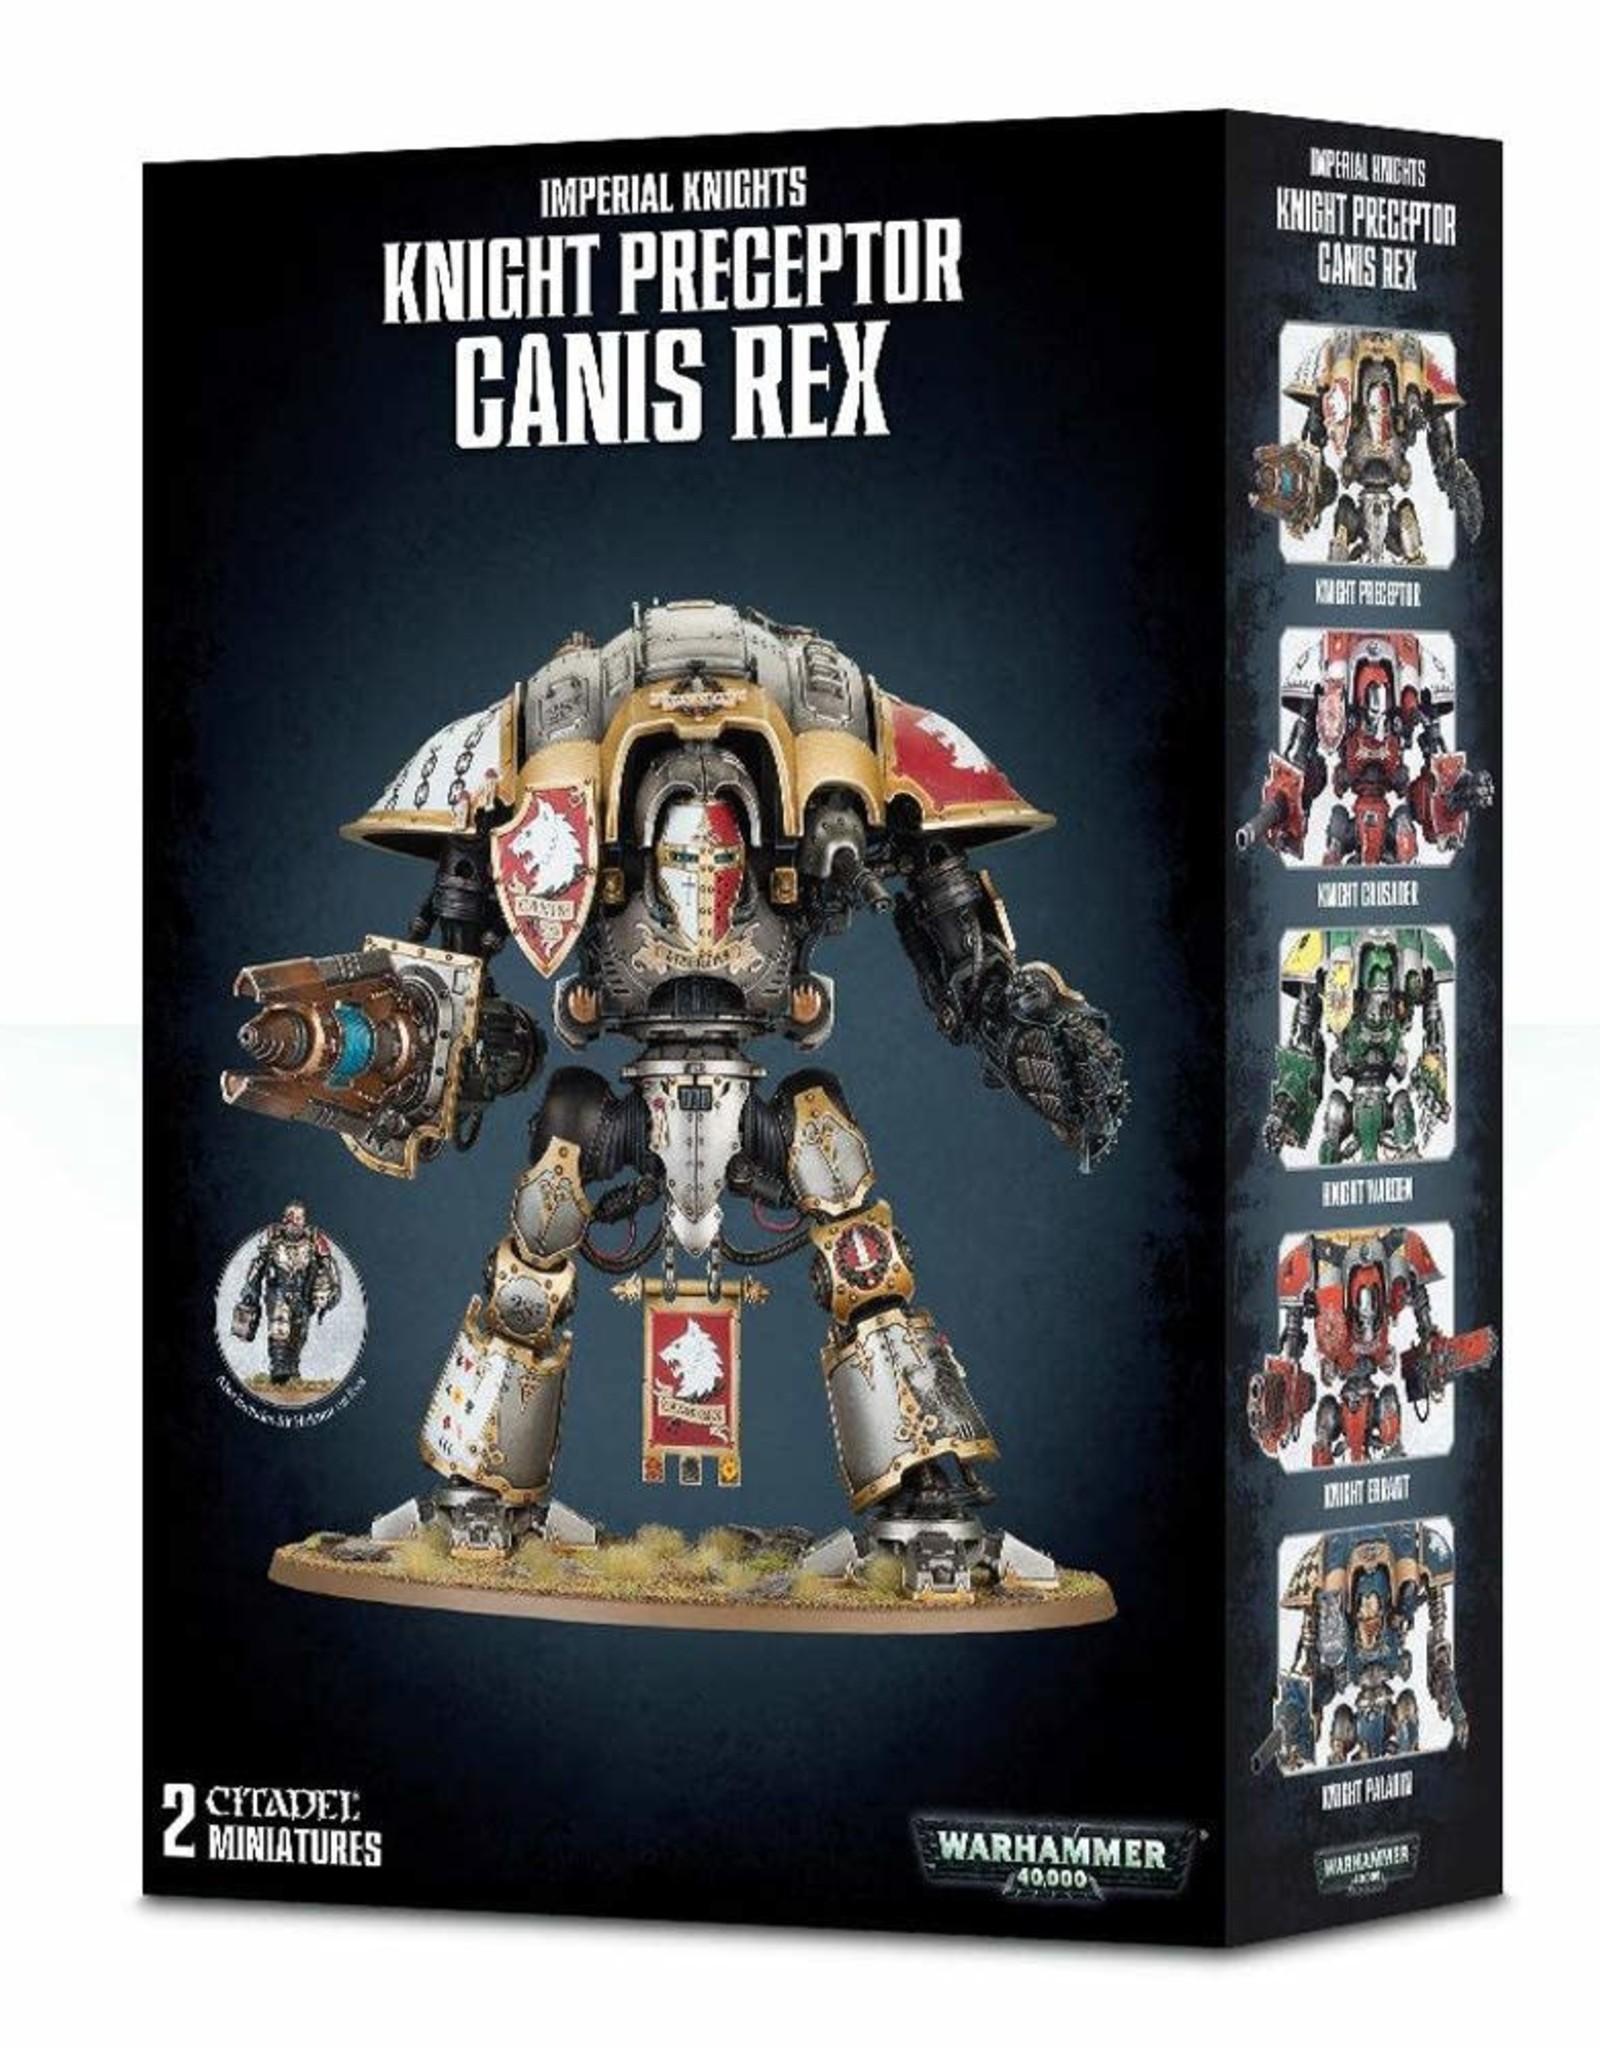 Warhammer 40K Knight Preceptor Canis Rex